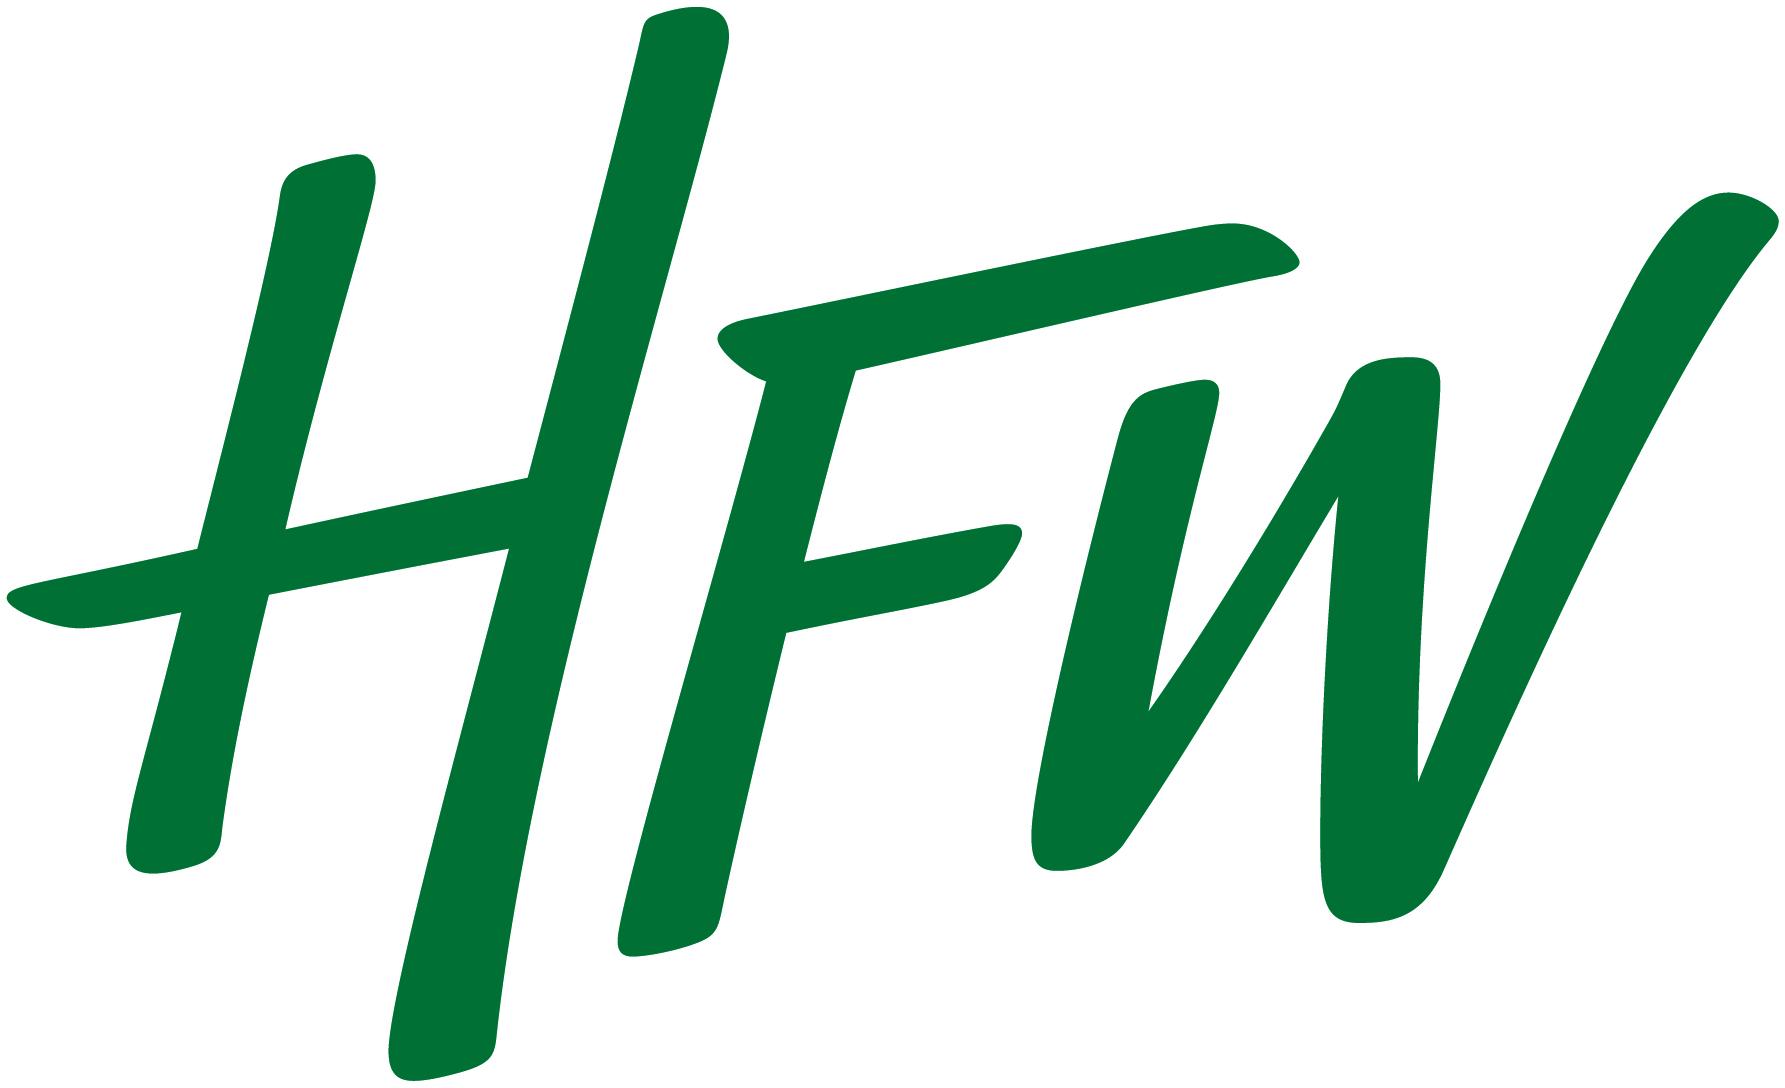 HFW_Standard_CMYK_C_Green